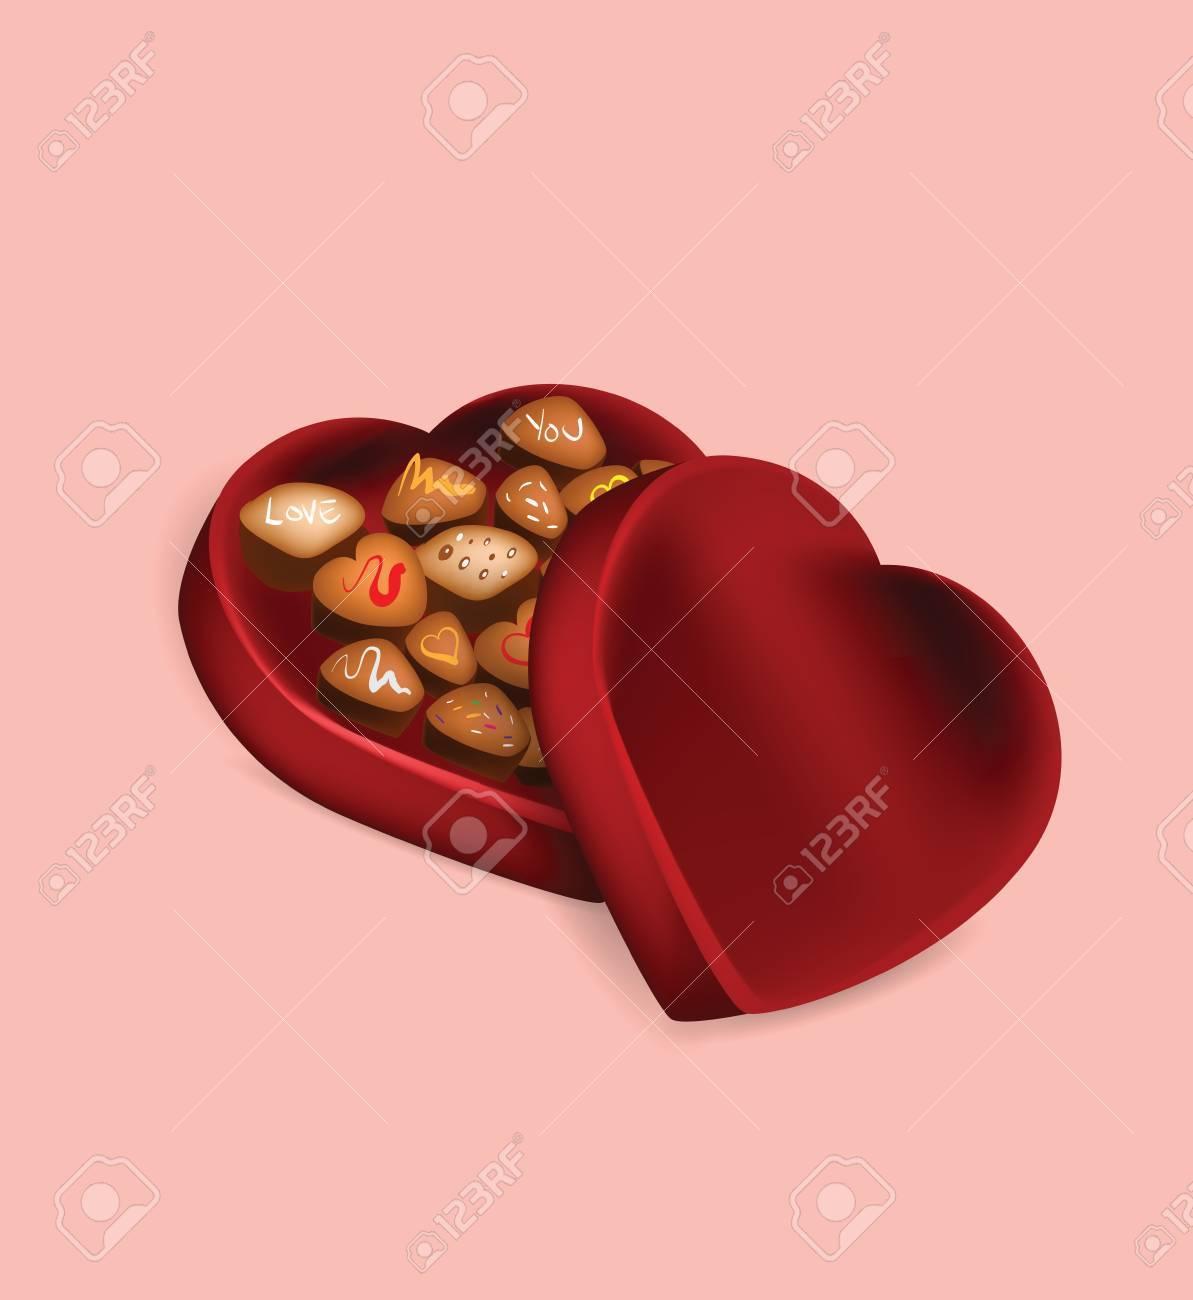 Illustration Of Valentine S Day Chocolate Box On Pink Background